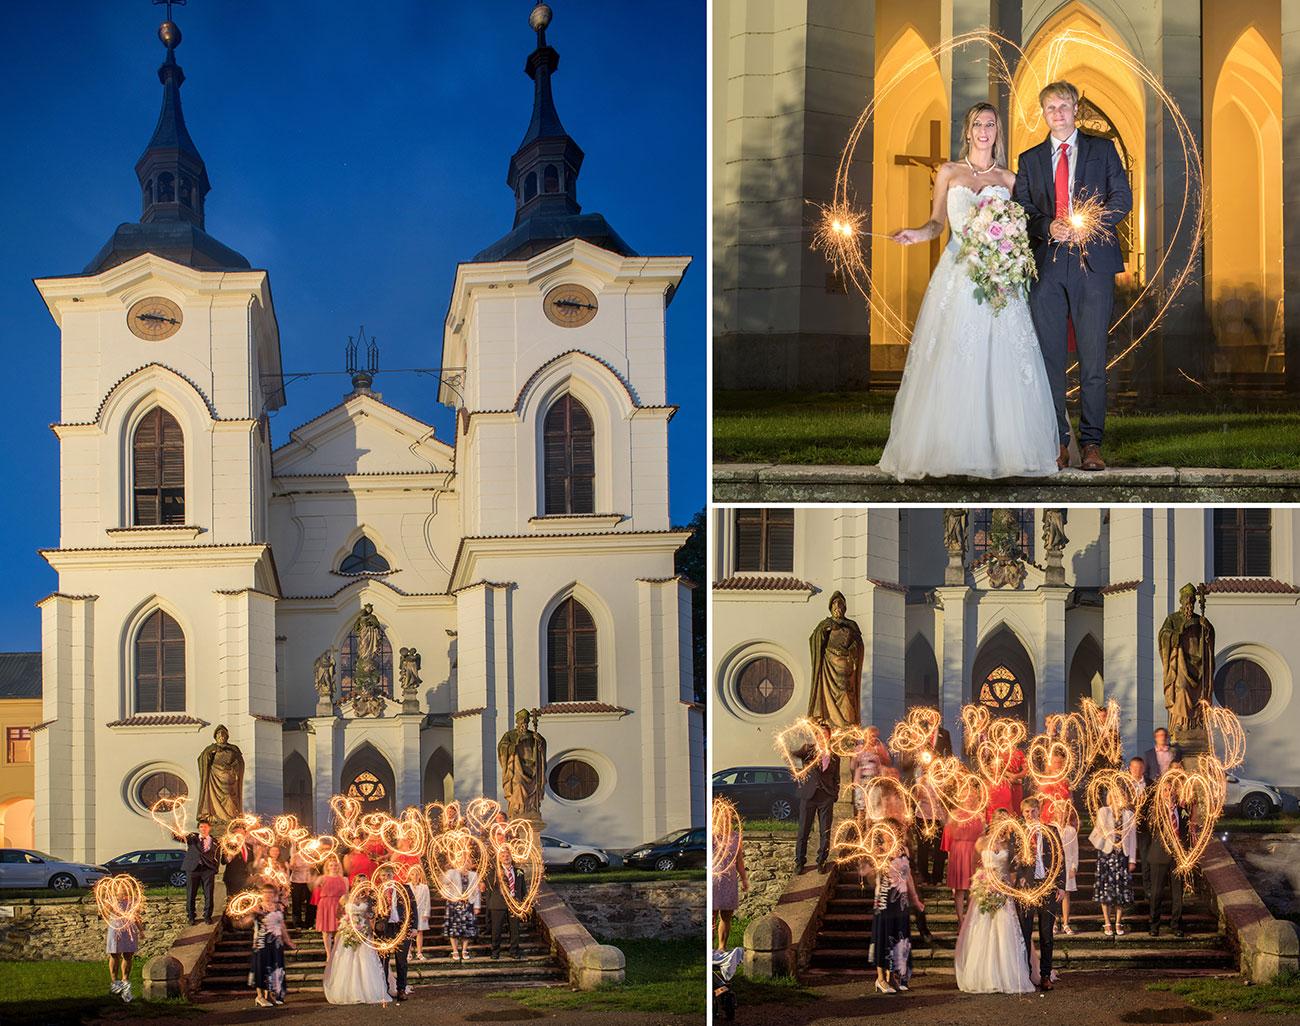 27 klater zeliv svatebni skupina s prskavkamii svatebni foto svatebni fotograf ales motejl 1